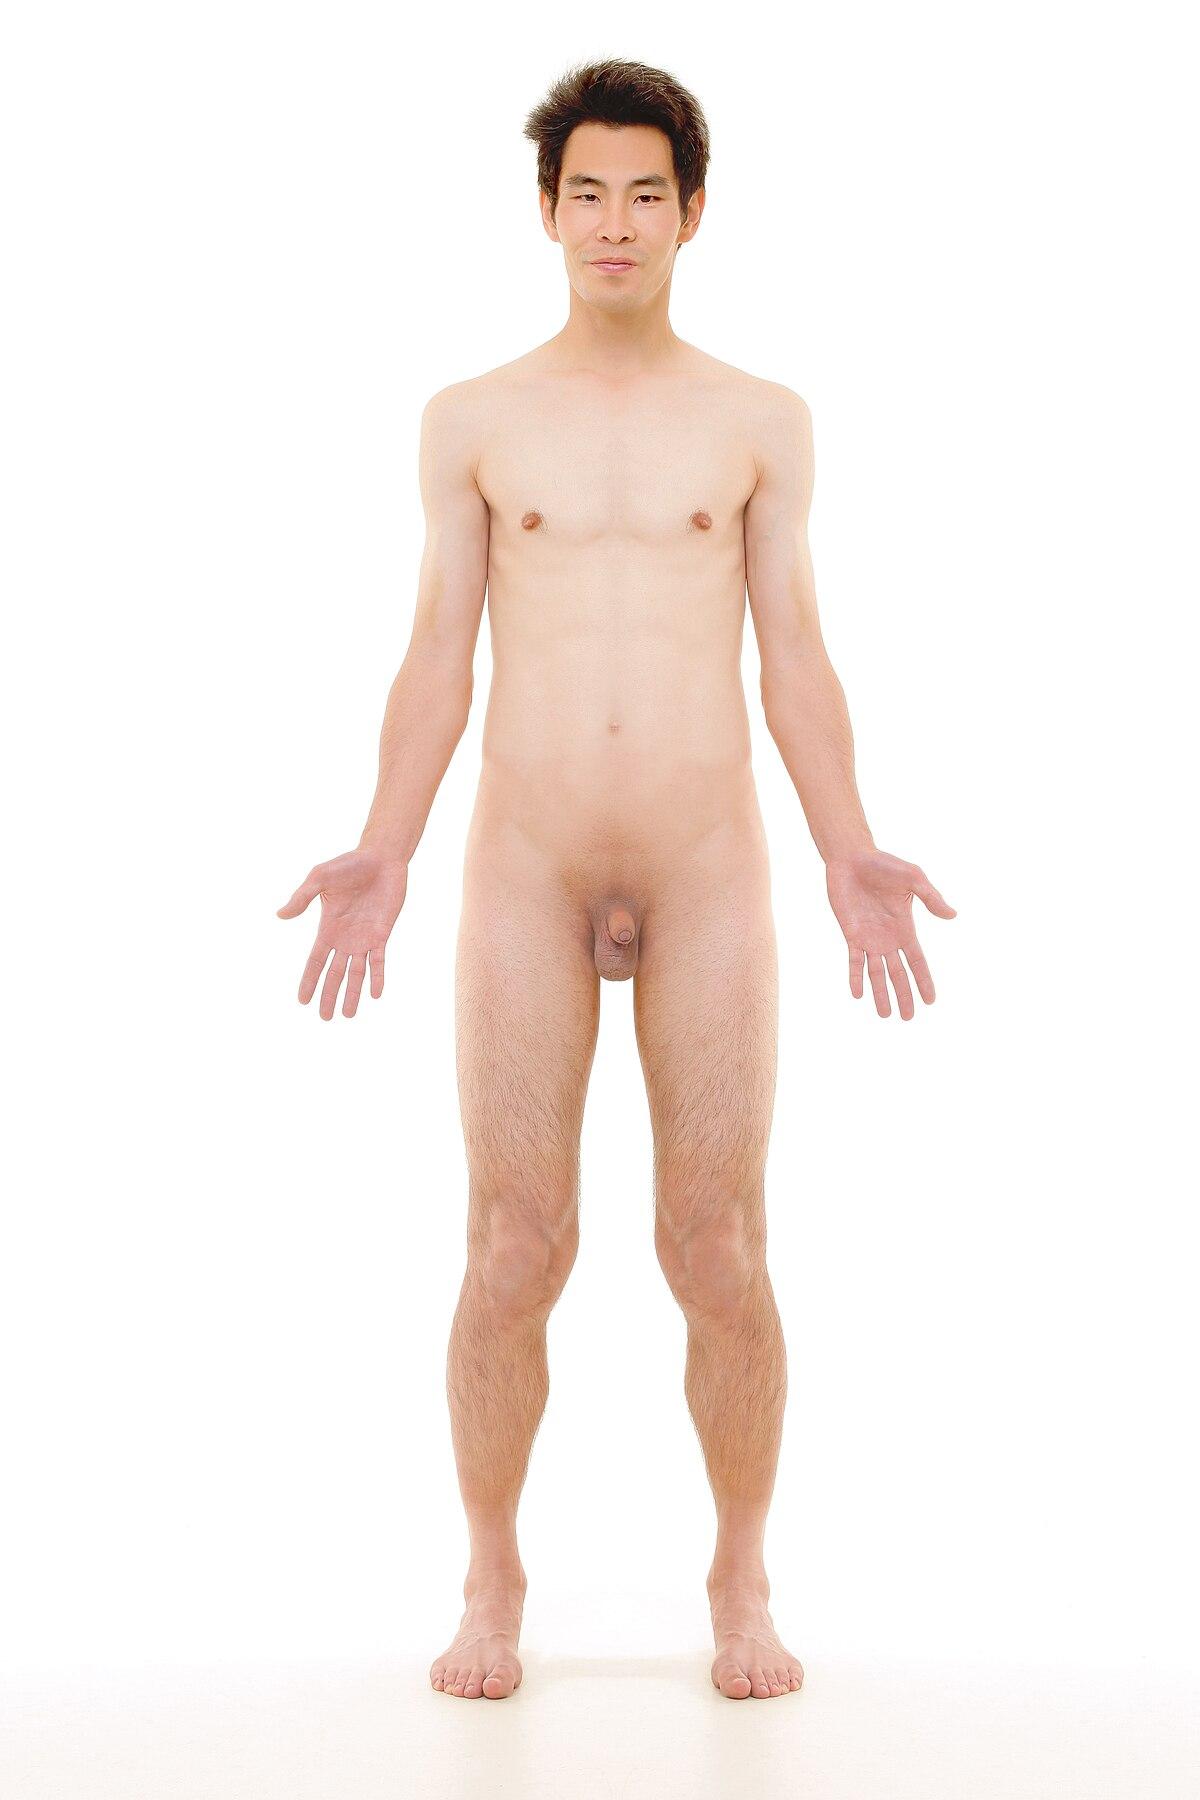 Huge tits nipples video gallery gang bang